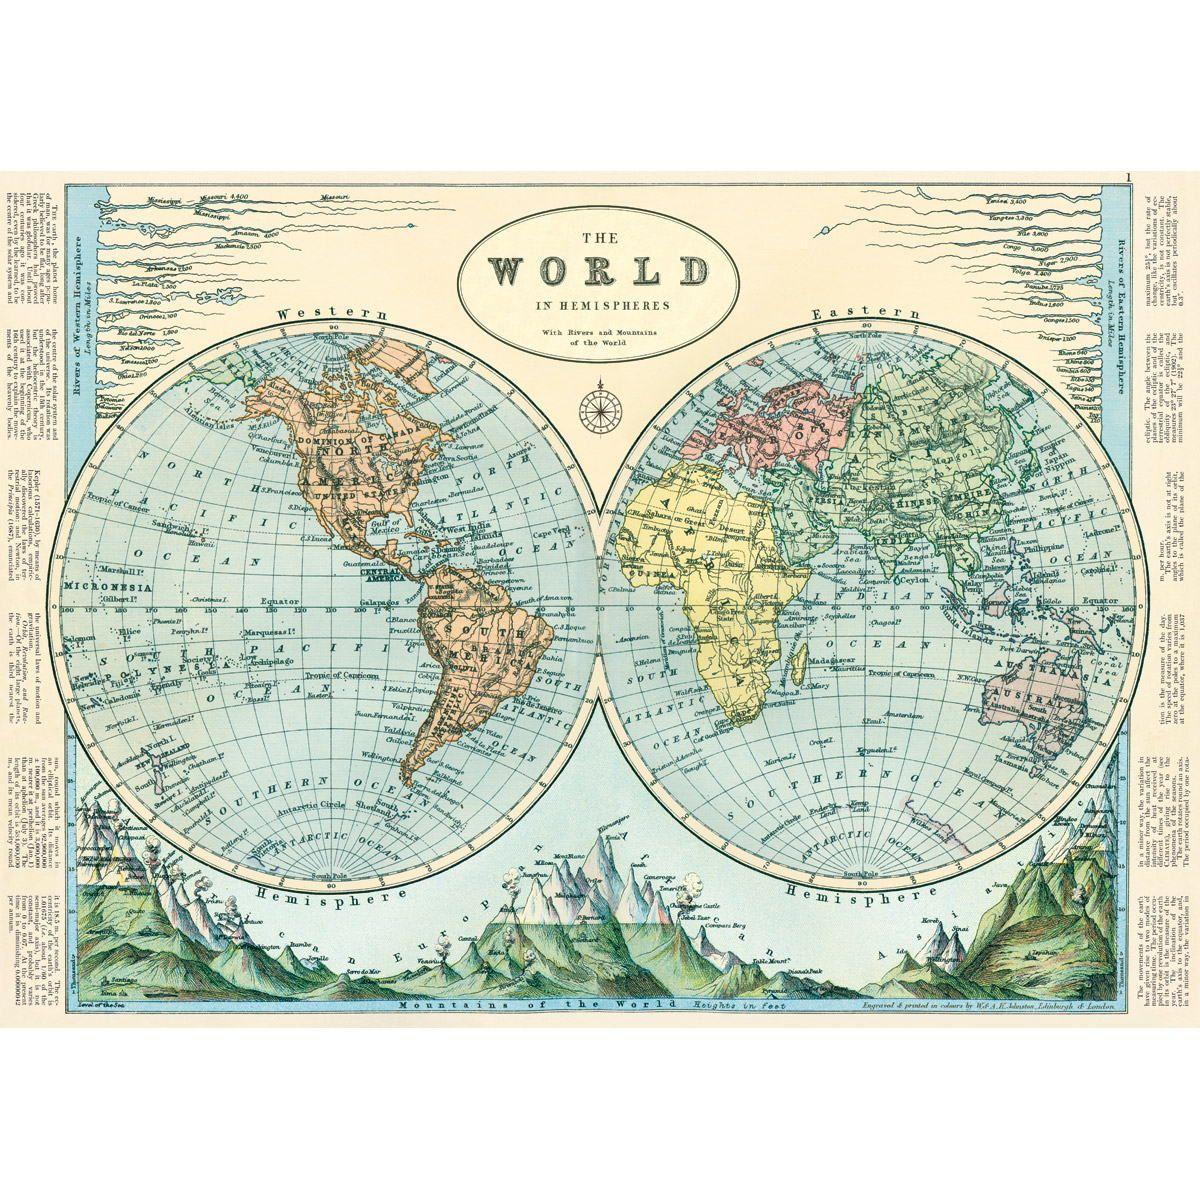 Hemispheres World Map Vintage Style Poster Vintage štýl Vintage - World map poster vintage style